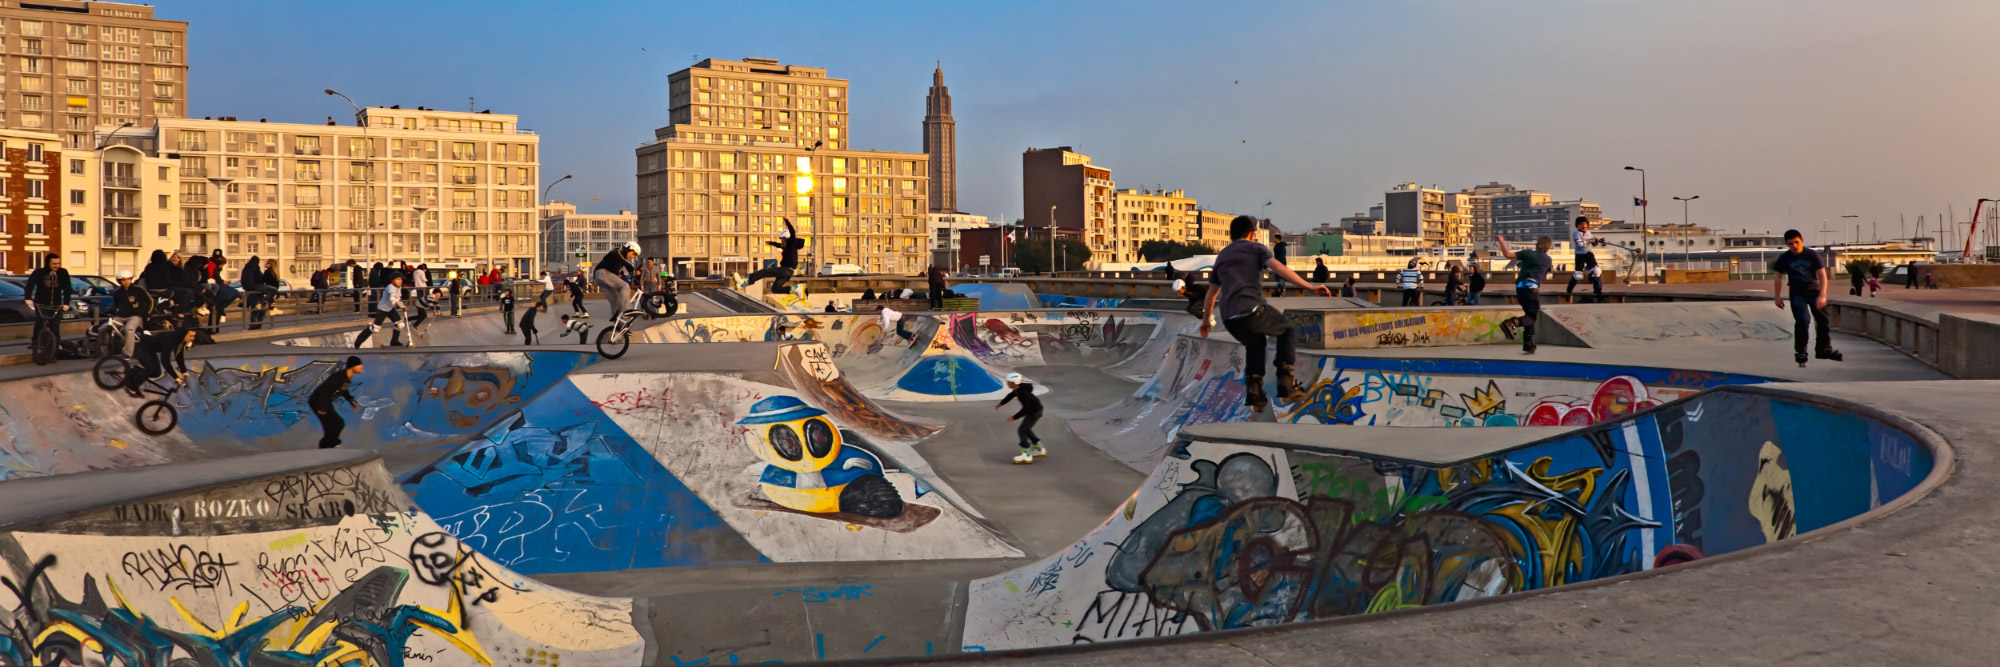 Skate-Park, Le Havre